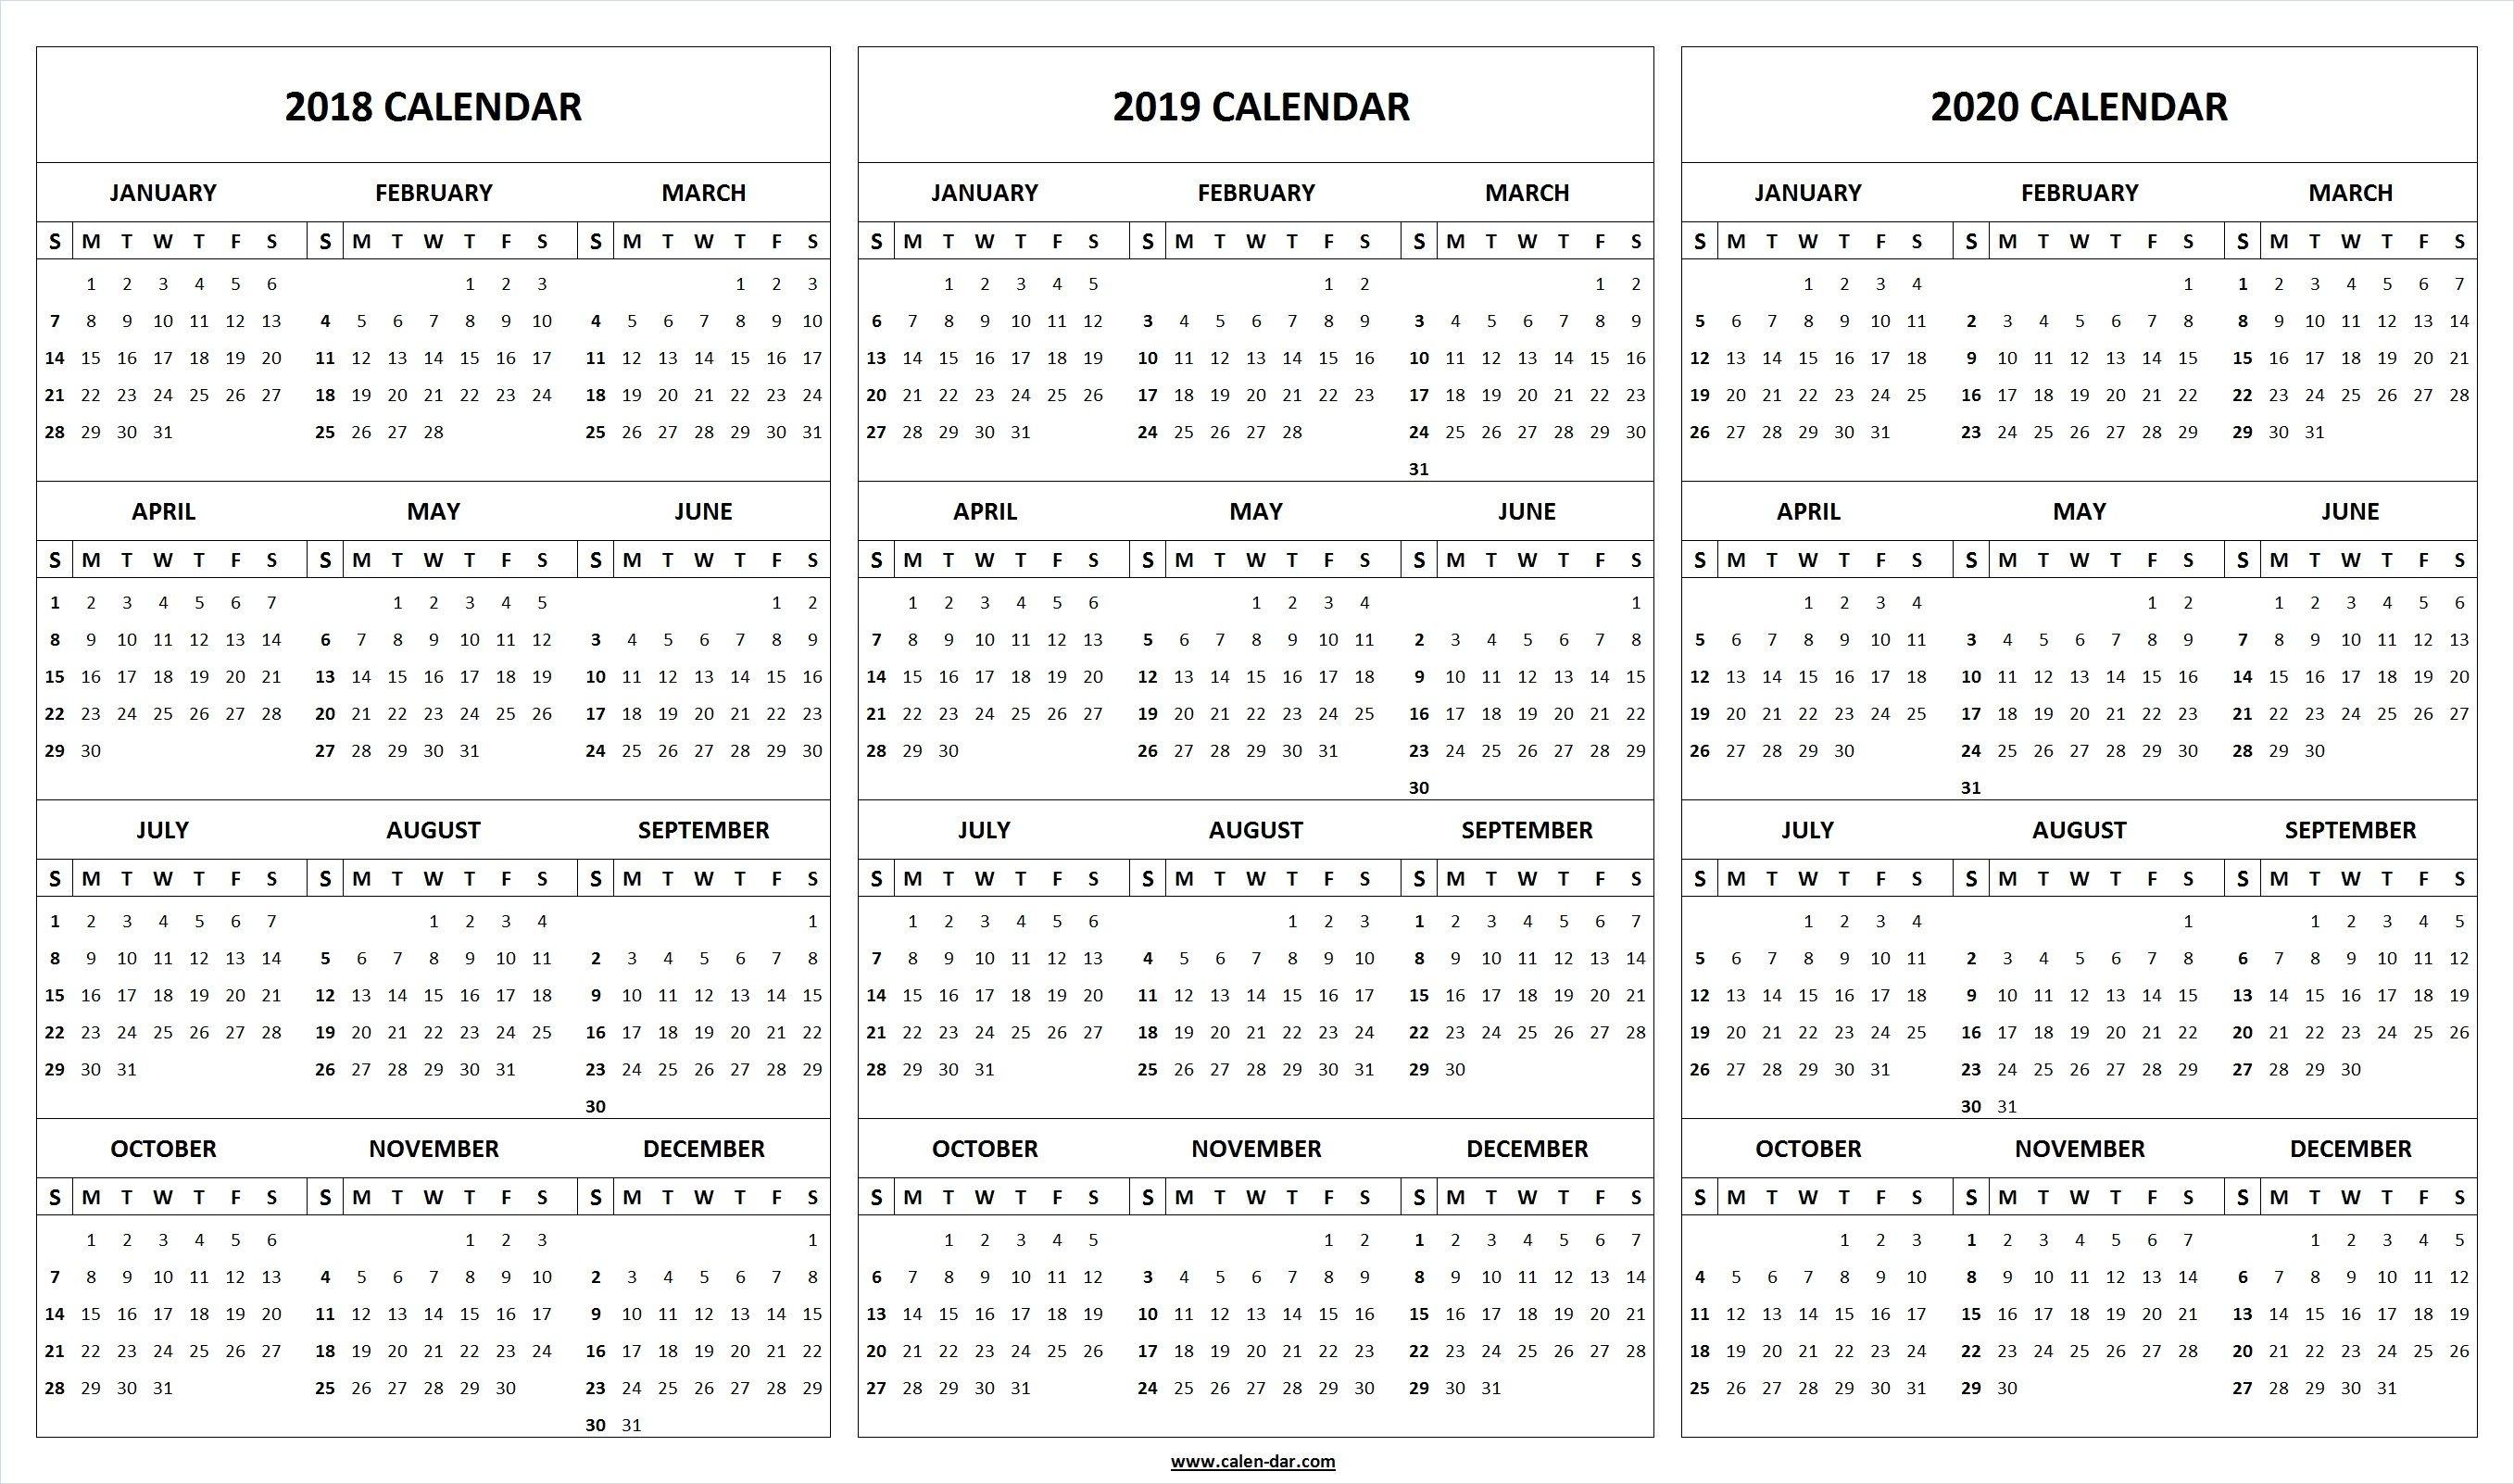 Print Blank 2018 2019 2020 Calendar Template | 2021 Calendar inside Blank Calendar 2019 2020 To Fill In